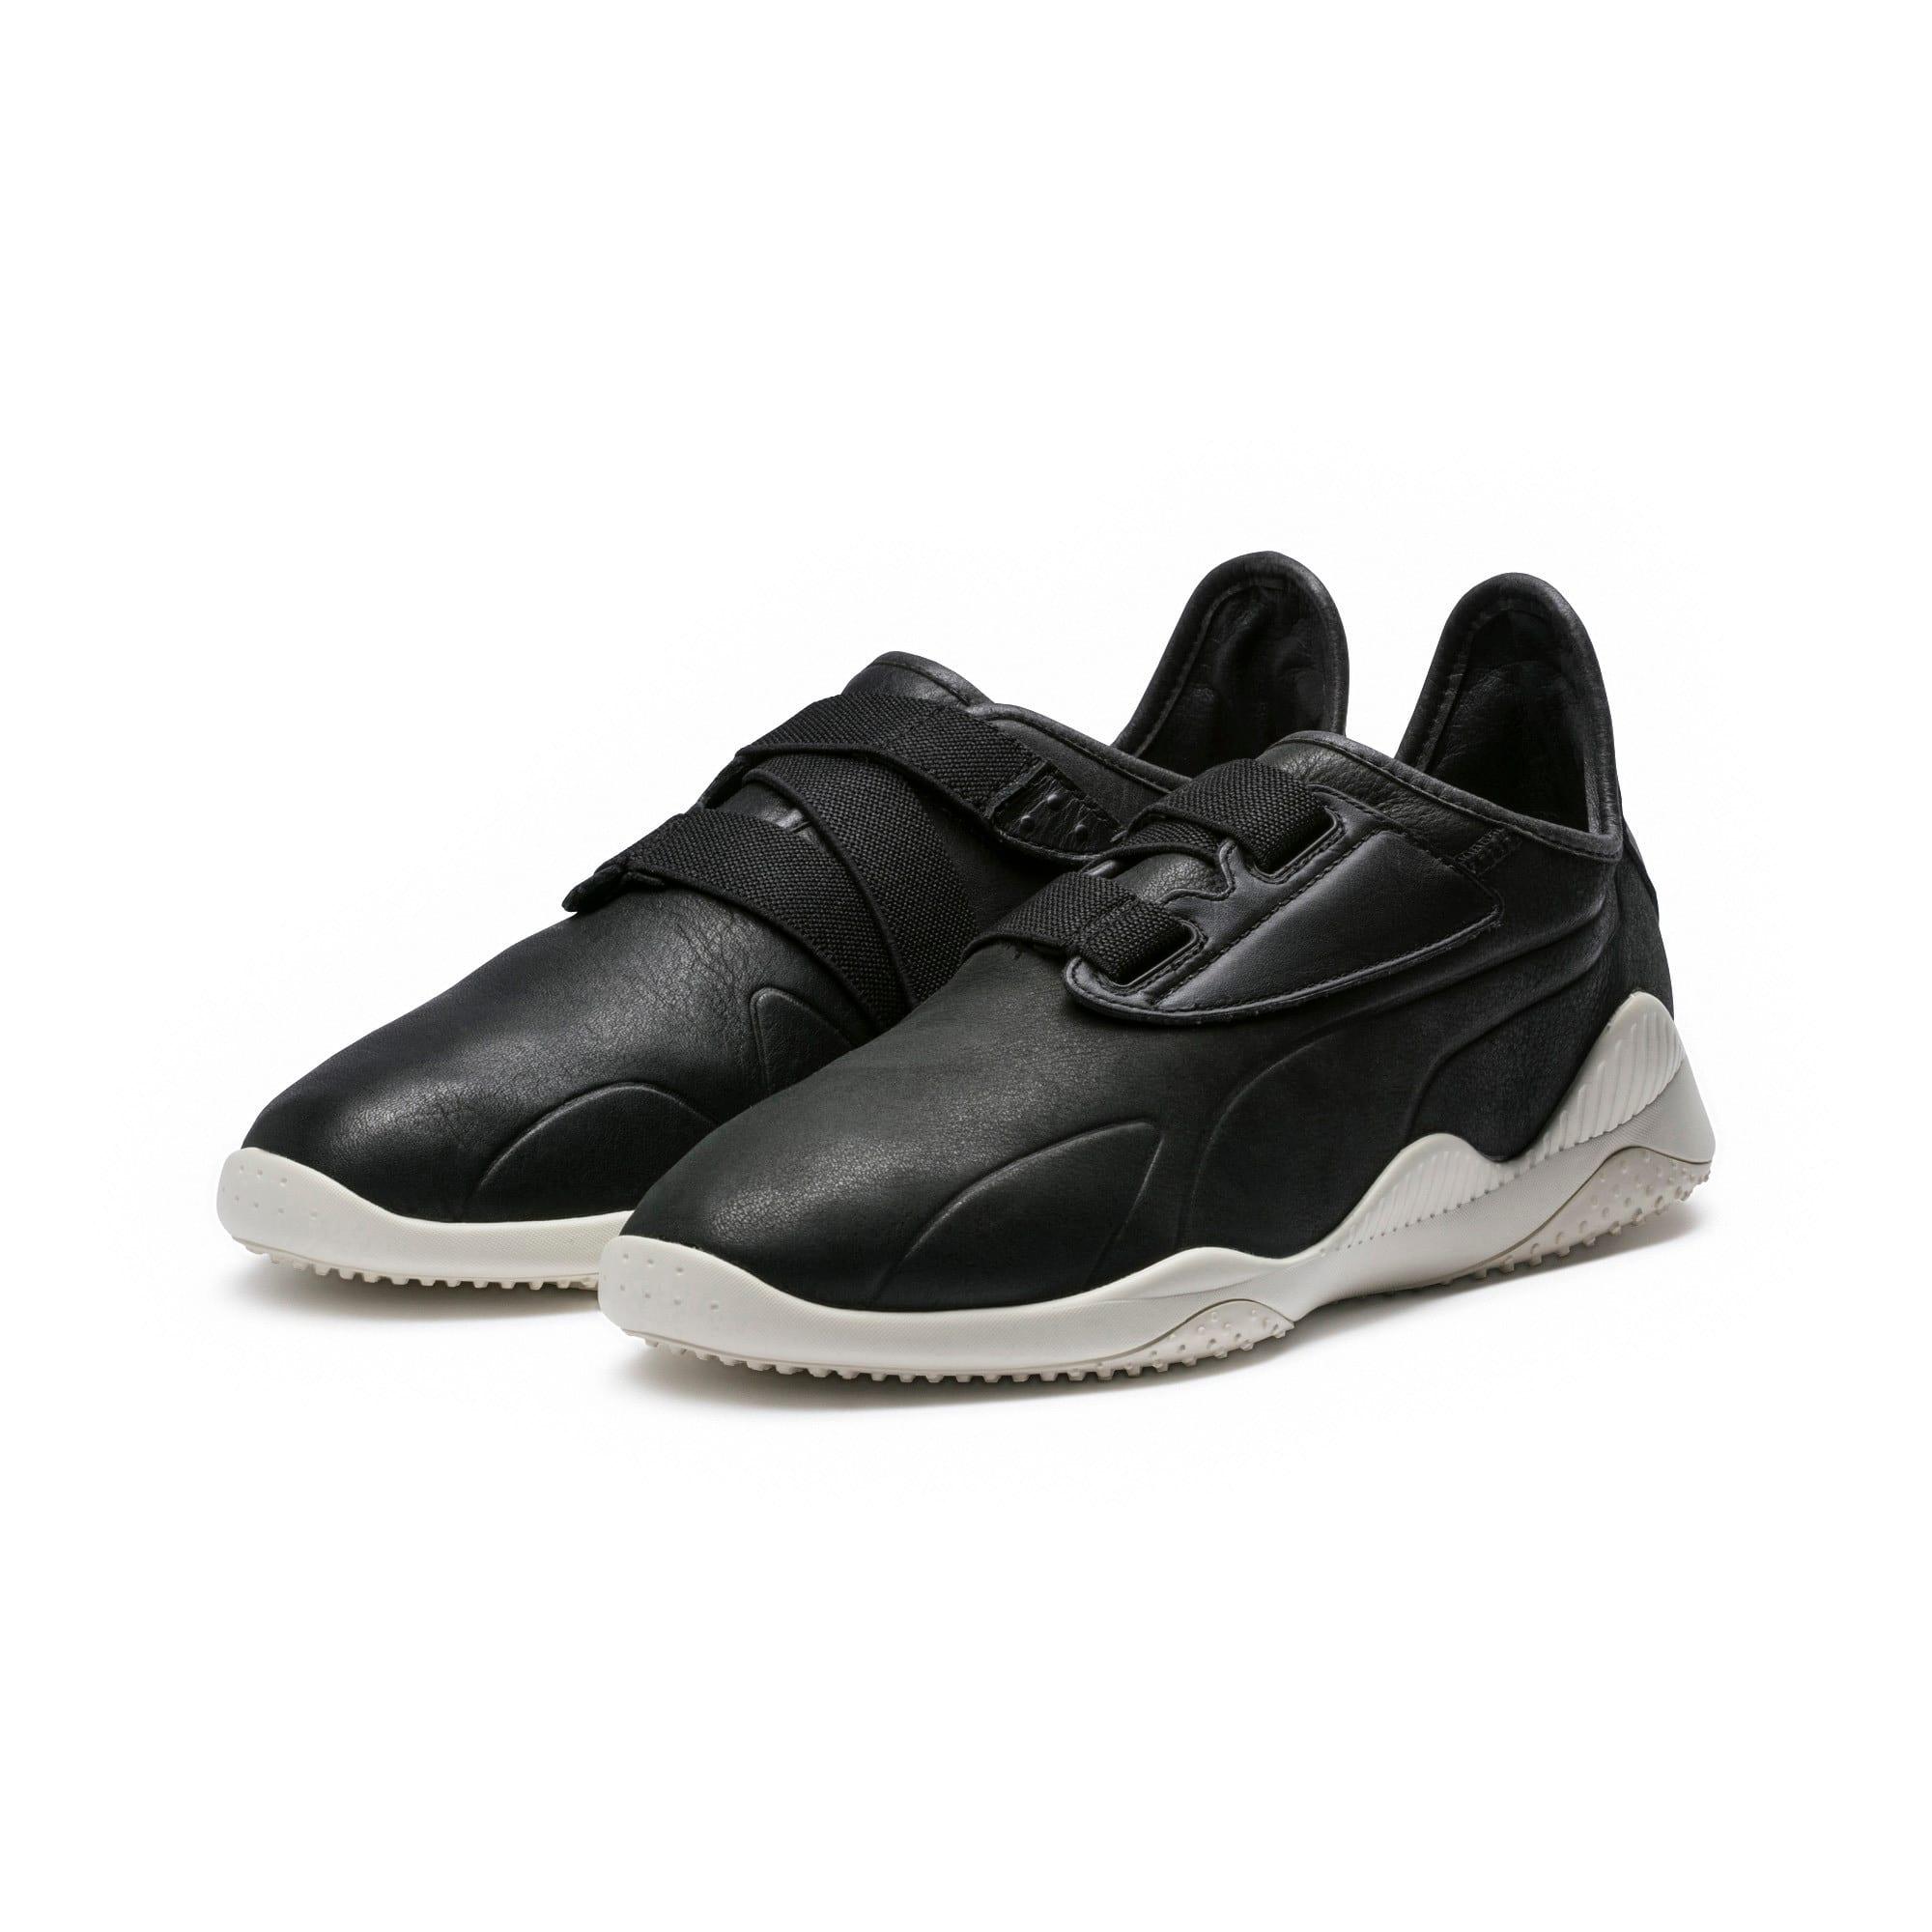 Thumbnail 2 of Mostro Premium, Puma Black-Whisper White, medium-IND